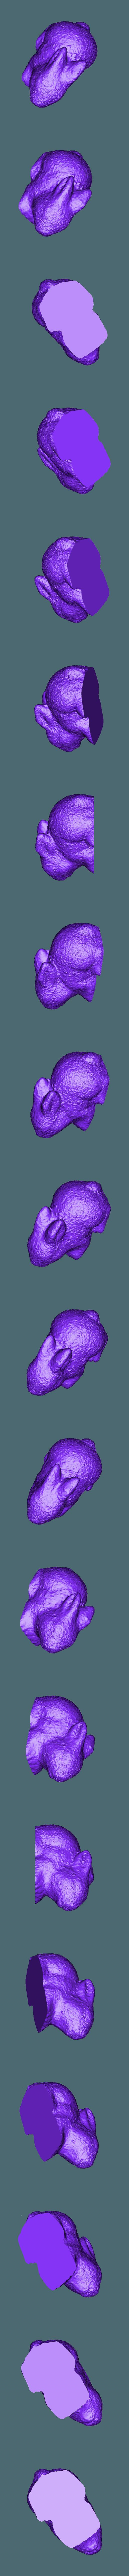 Texturedrabbit.stl Download free STL file TexturedRabbit • Design to 3D print, Digitang3D